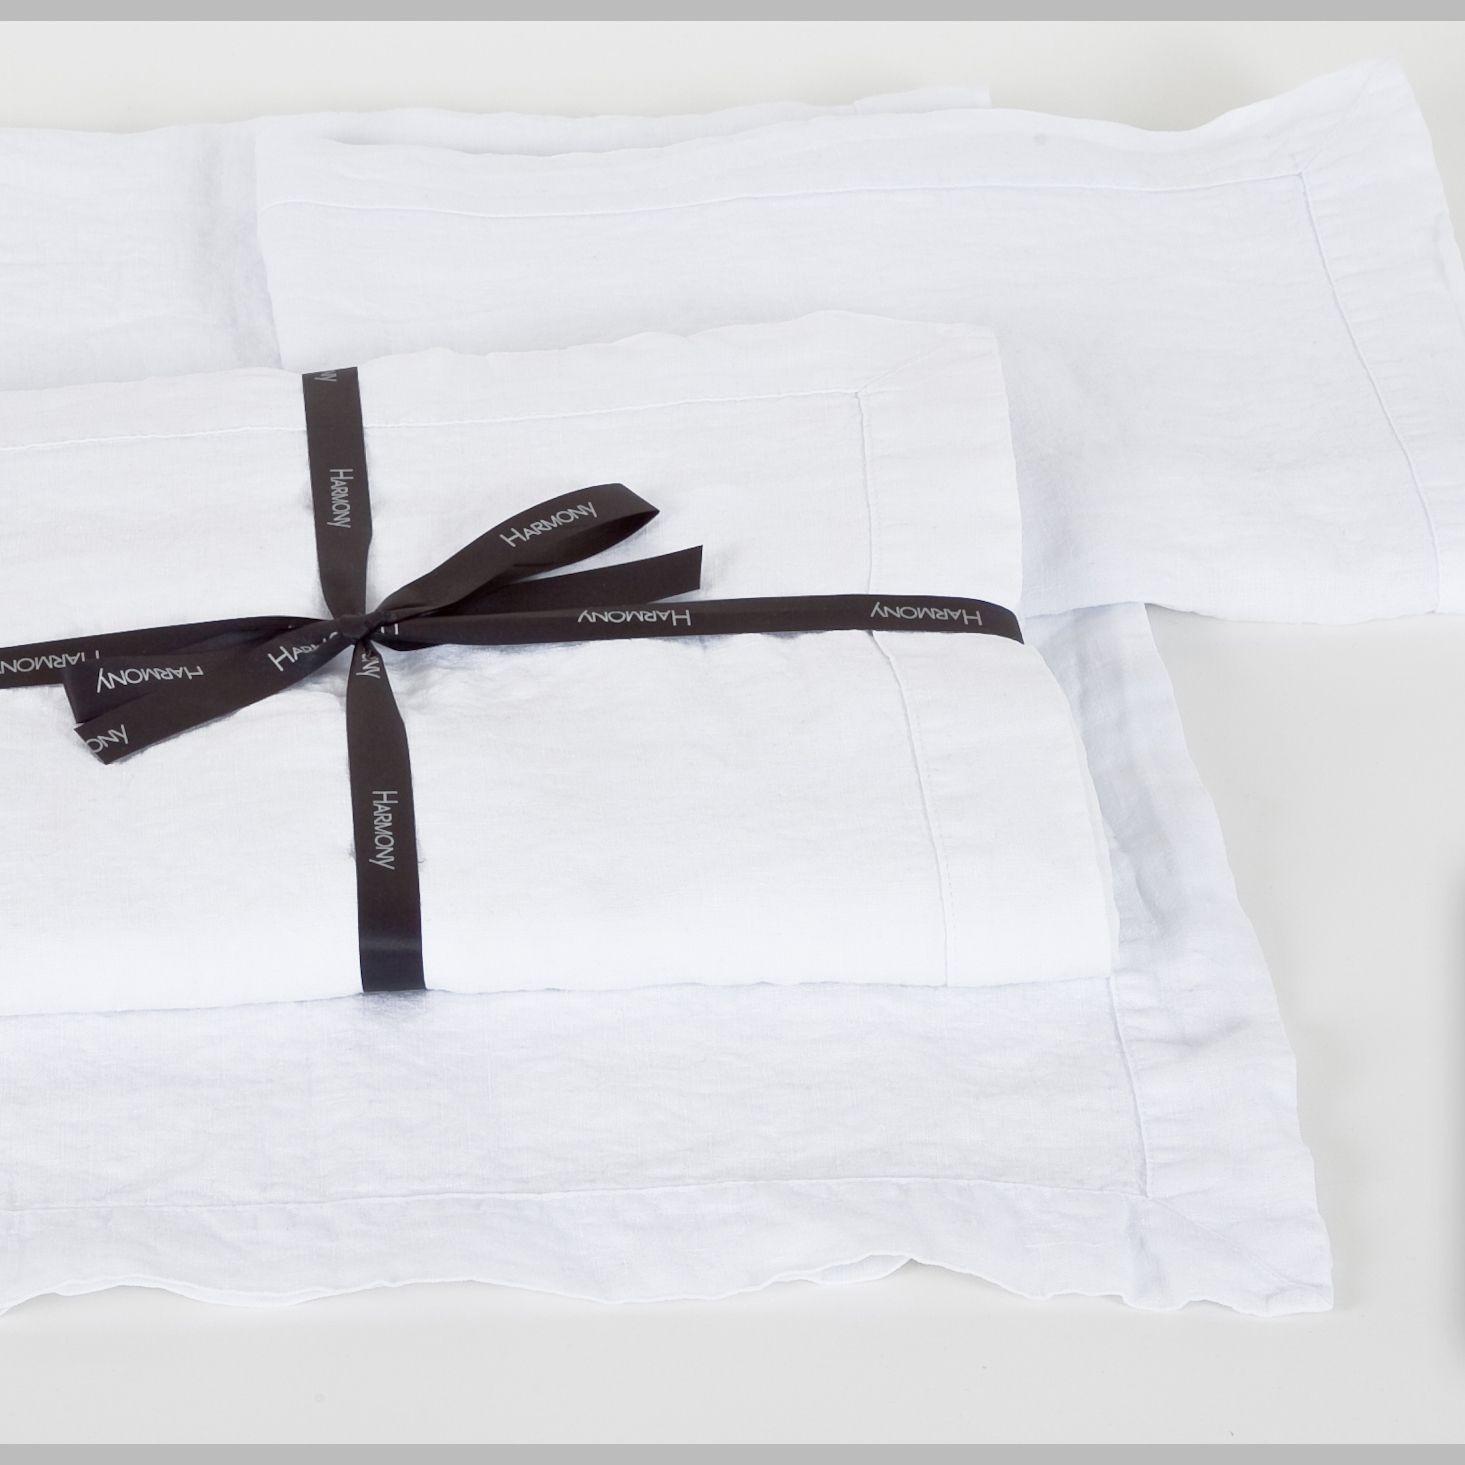 Naîs - Nappe 170x250 100%Lin stonewash blanc